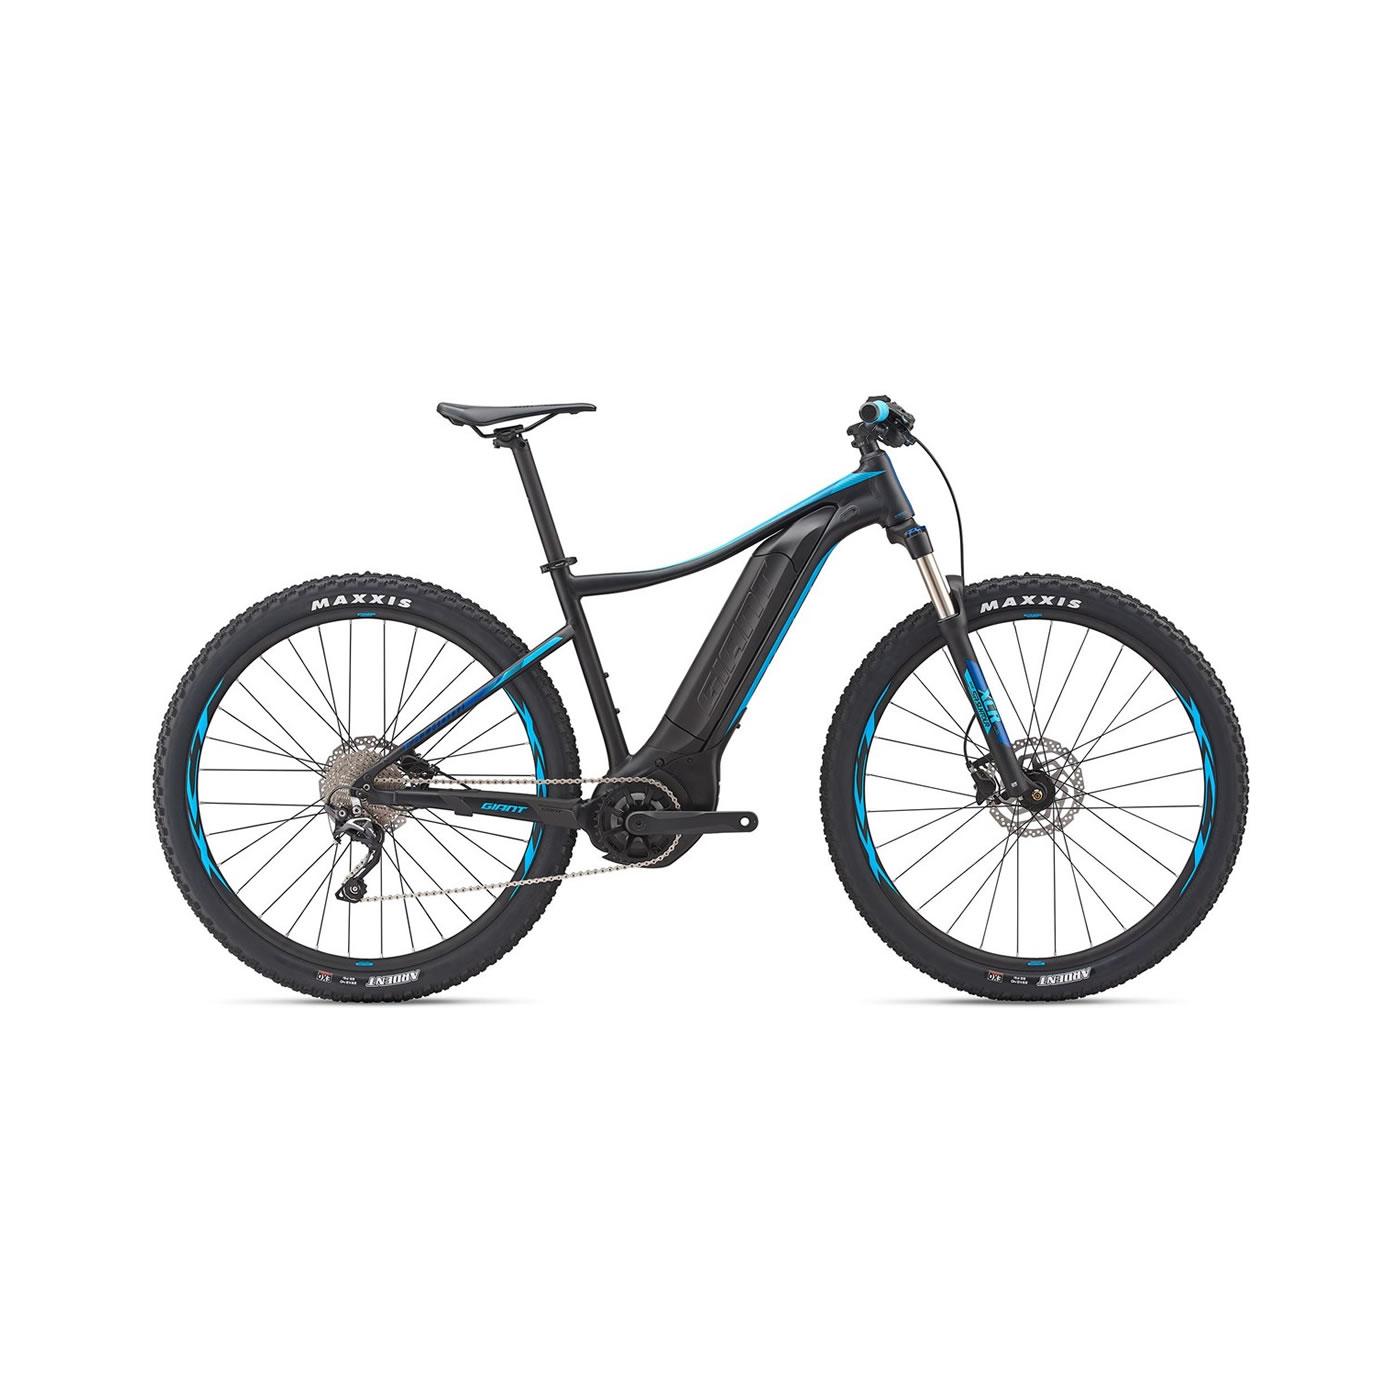 giant fathom e 2 29er 2019 electric mountain bike. Black Bedroom Furniture Sets. Home Design Ideas